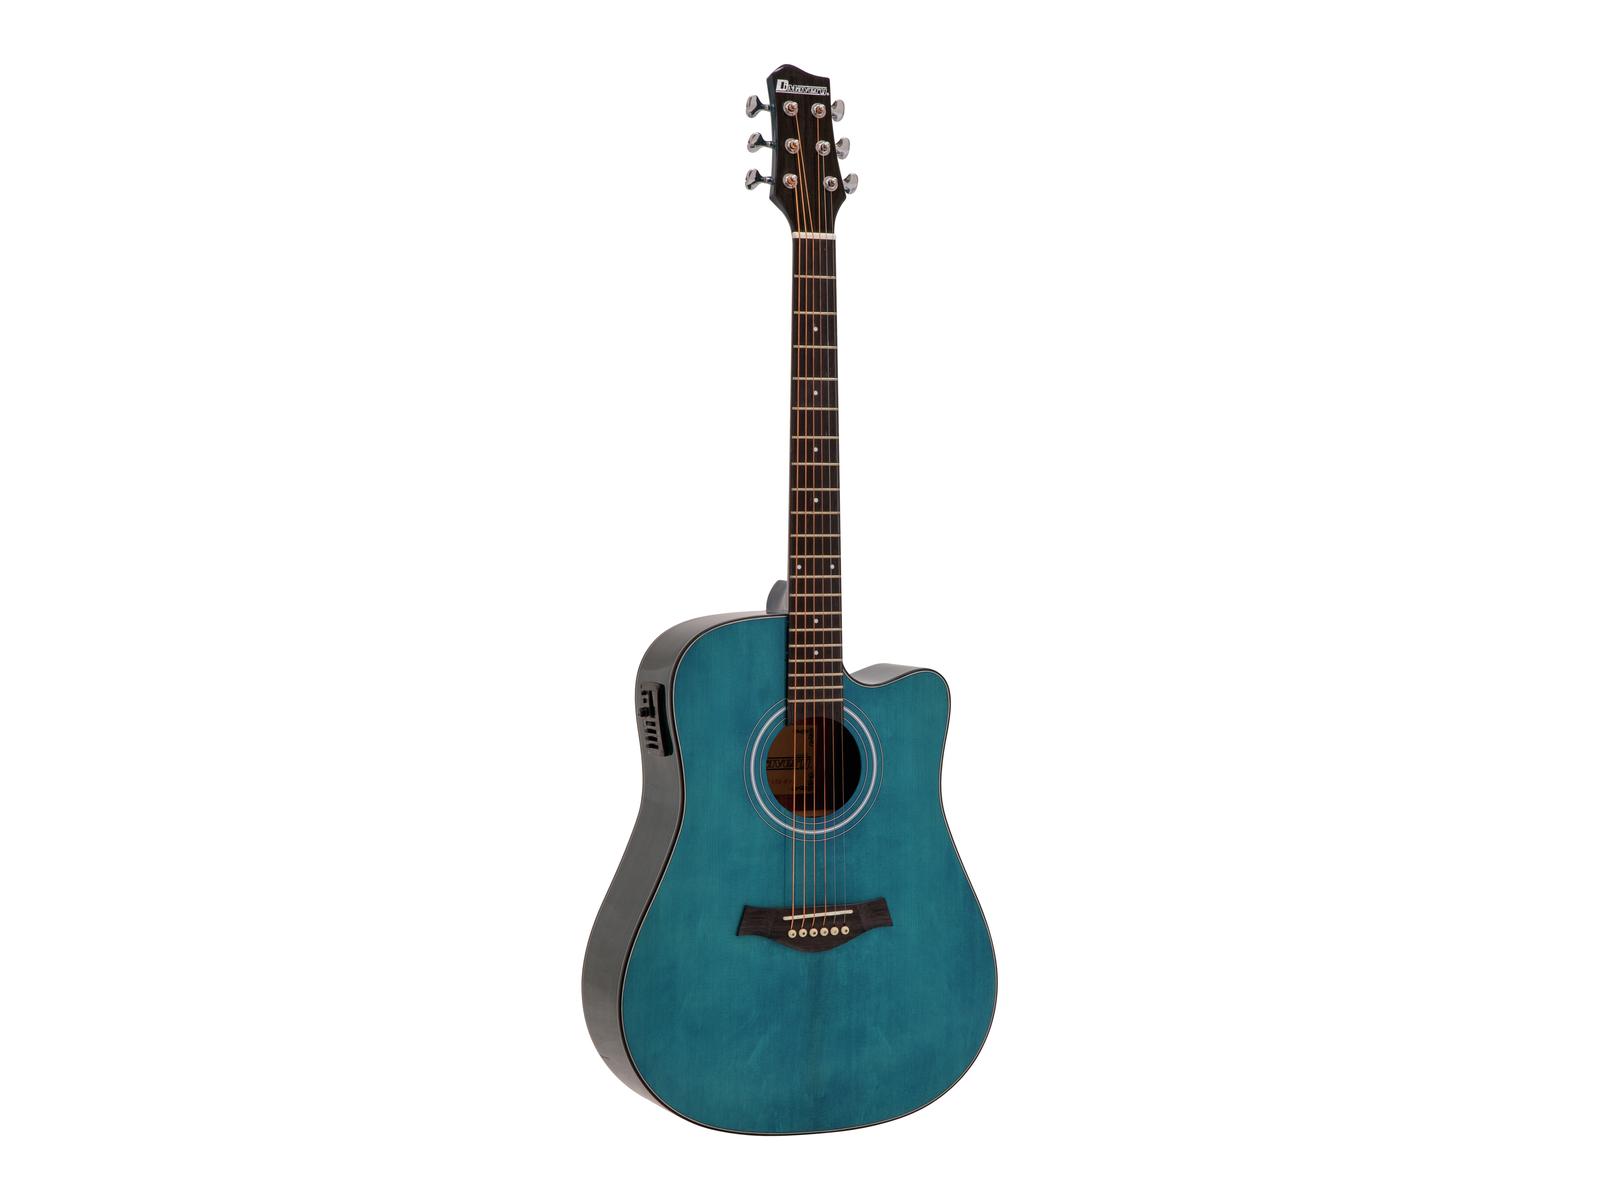 DIMAVERY STW-90 Westerngitarre, crystal blue